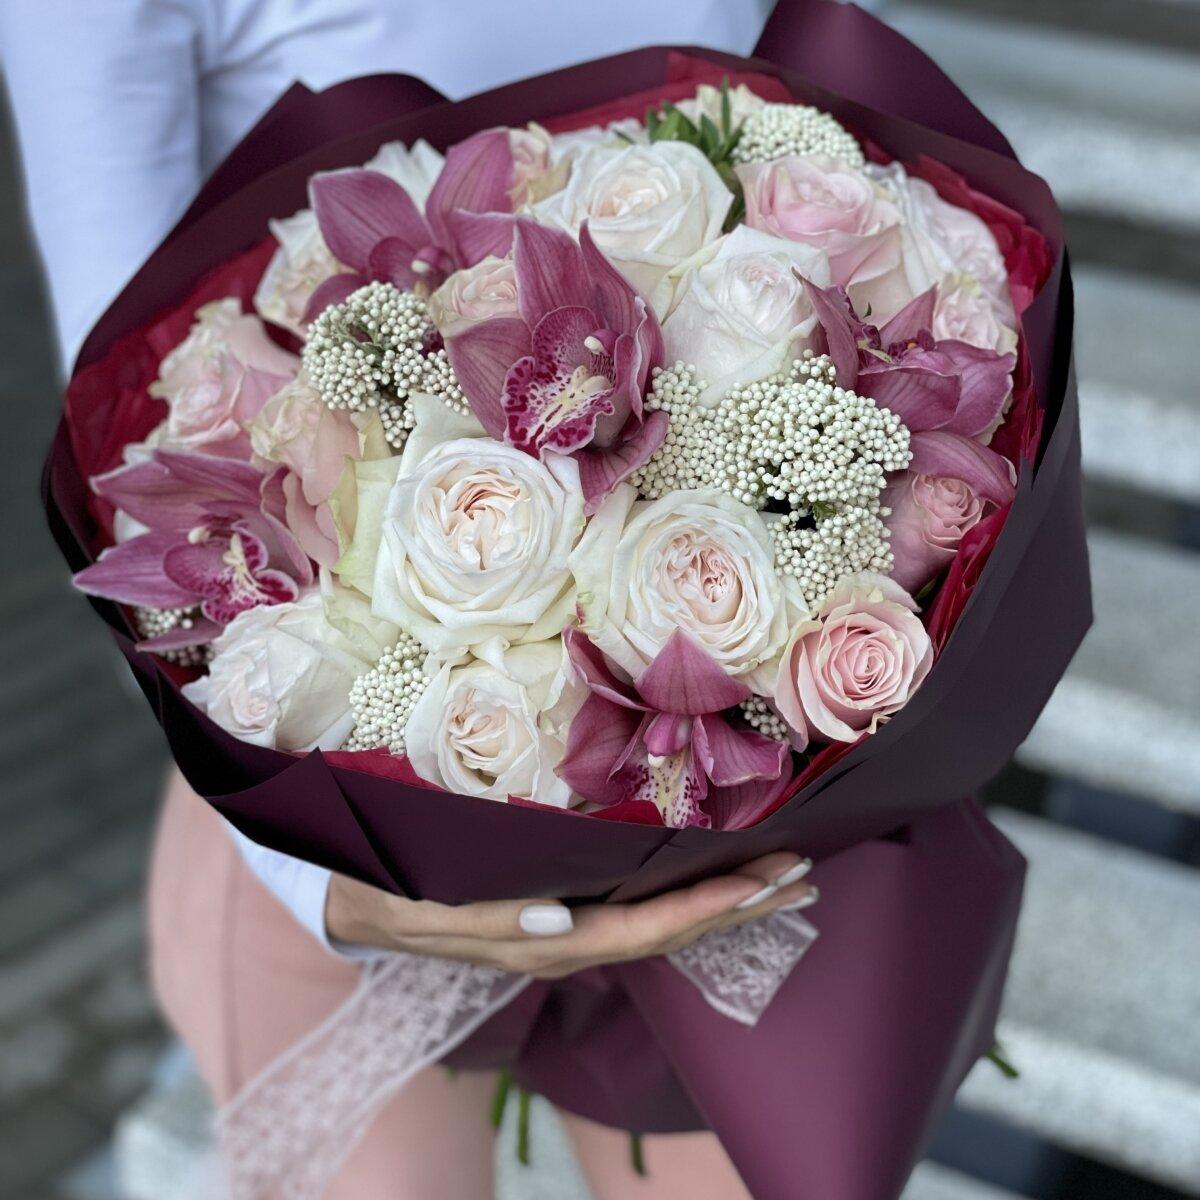 Букет Диадема из озотамнуса, цимбидиума и роз сорта Пинк Мондиал и Охара